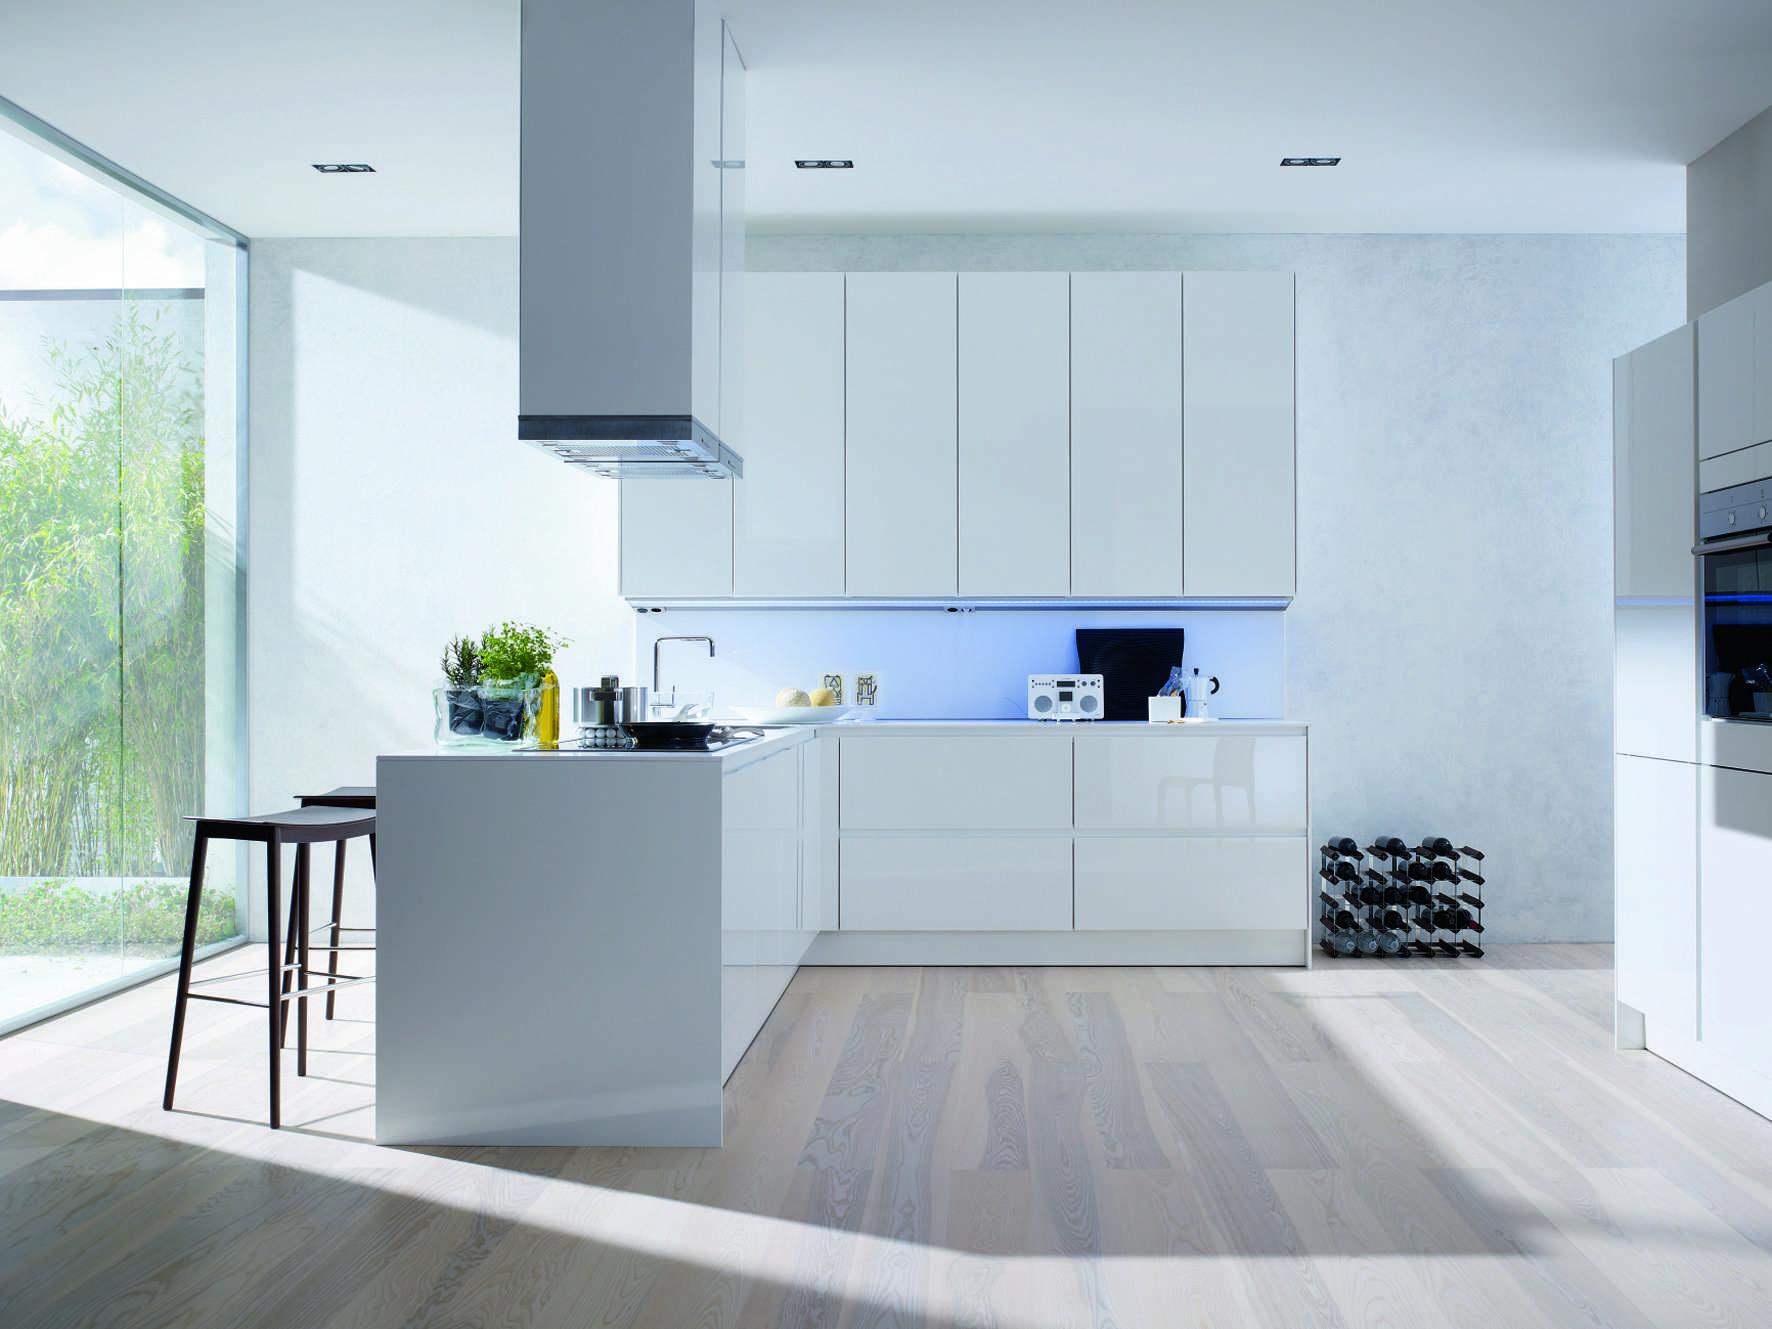 Hardwood Floor Modern Kitchen Remodels Floors Options Flooring